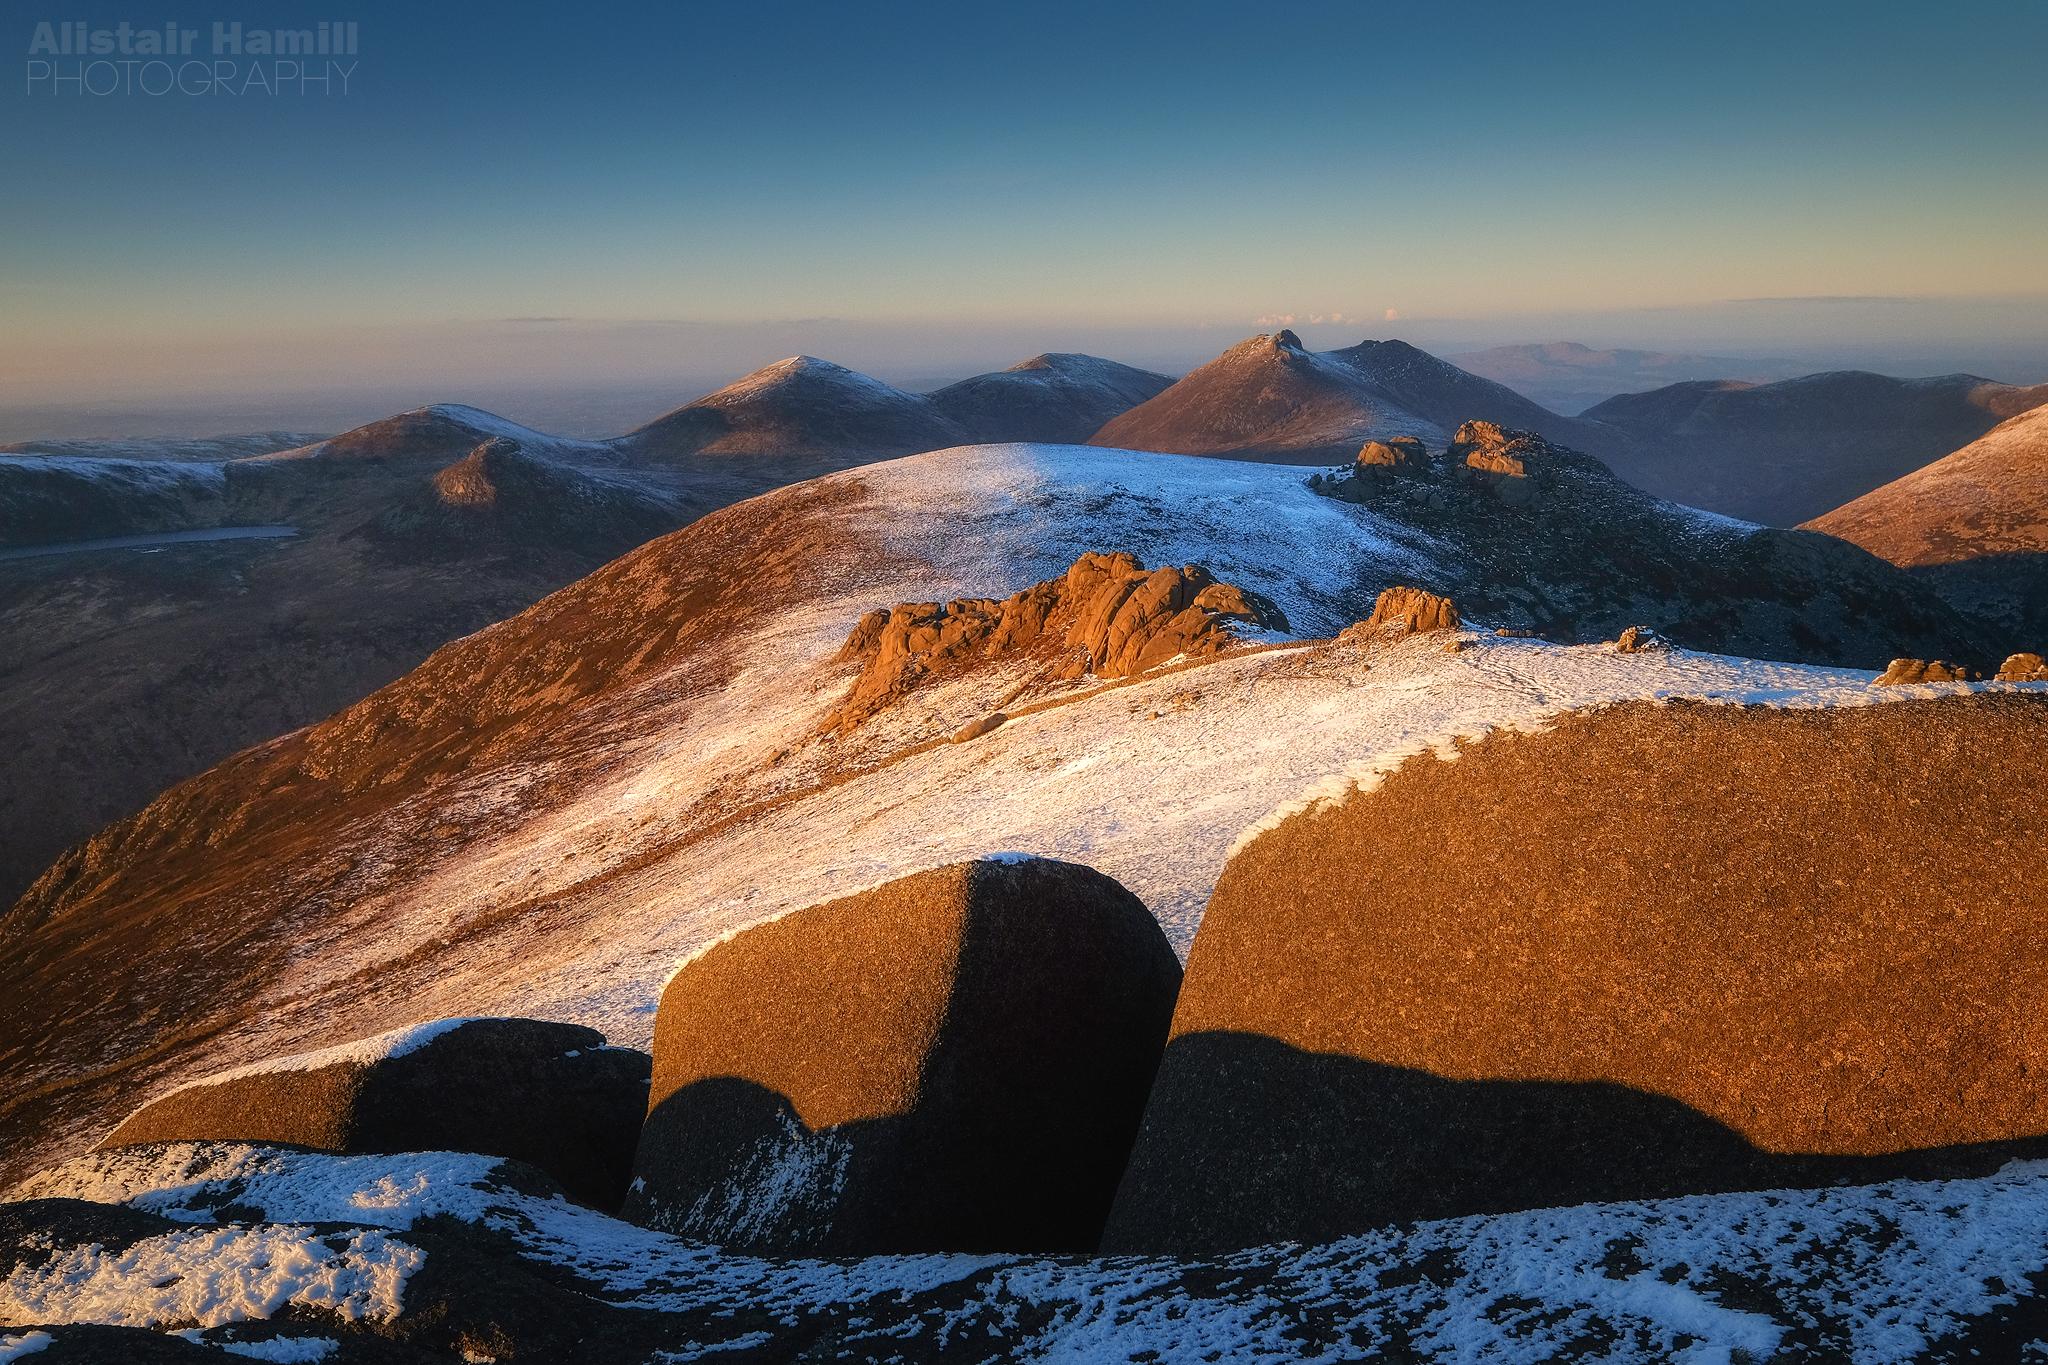 Binnian snow 1 (large) WM.jpg